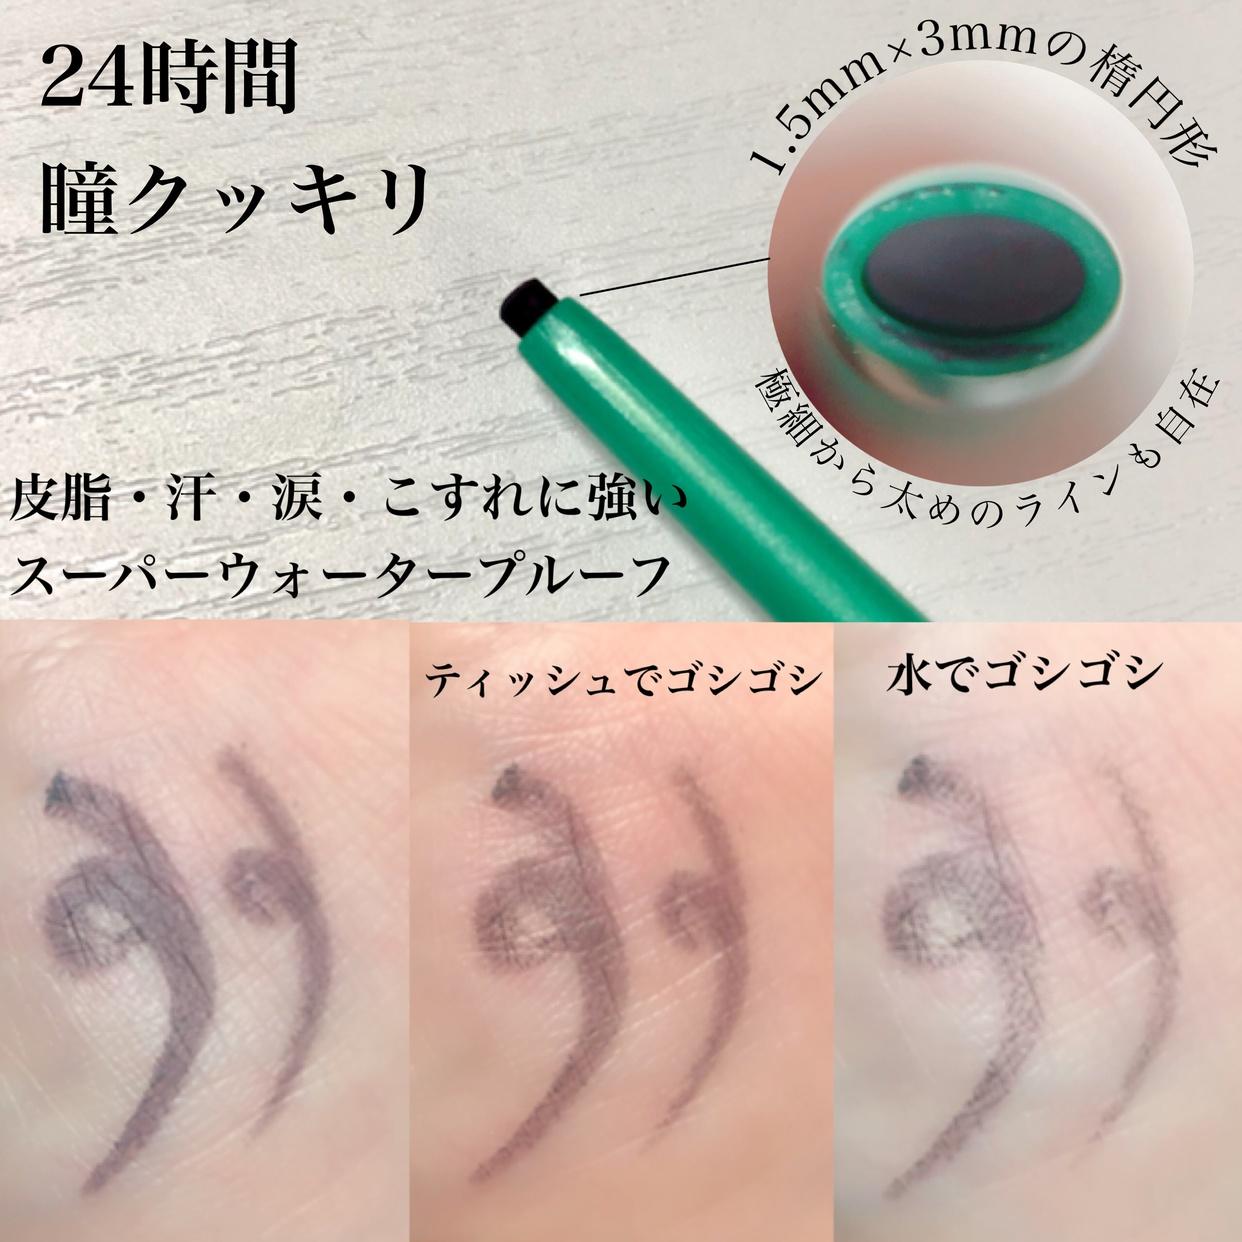 dejavu(デジャヴュ) ラスティンファイン クリームペンシルを使ったsachikoさんのクチコミ画像2